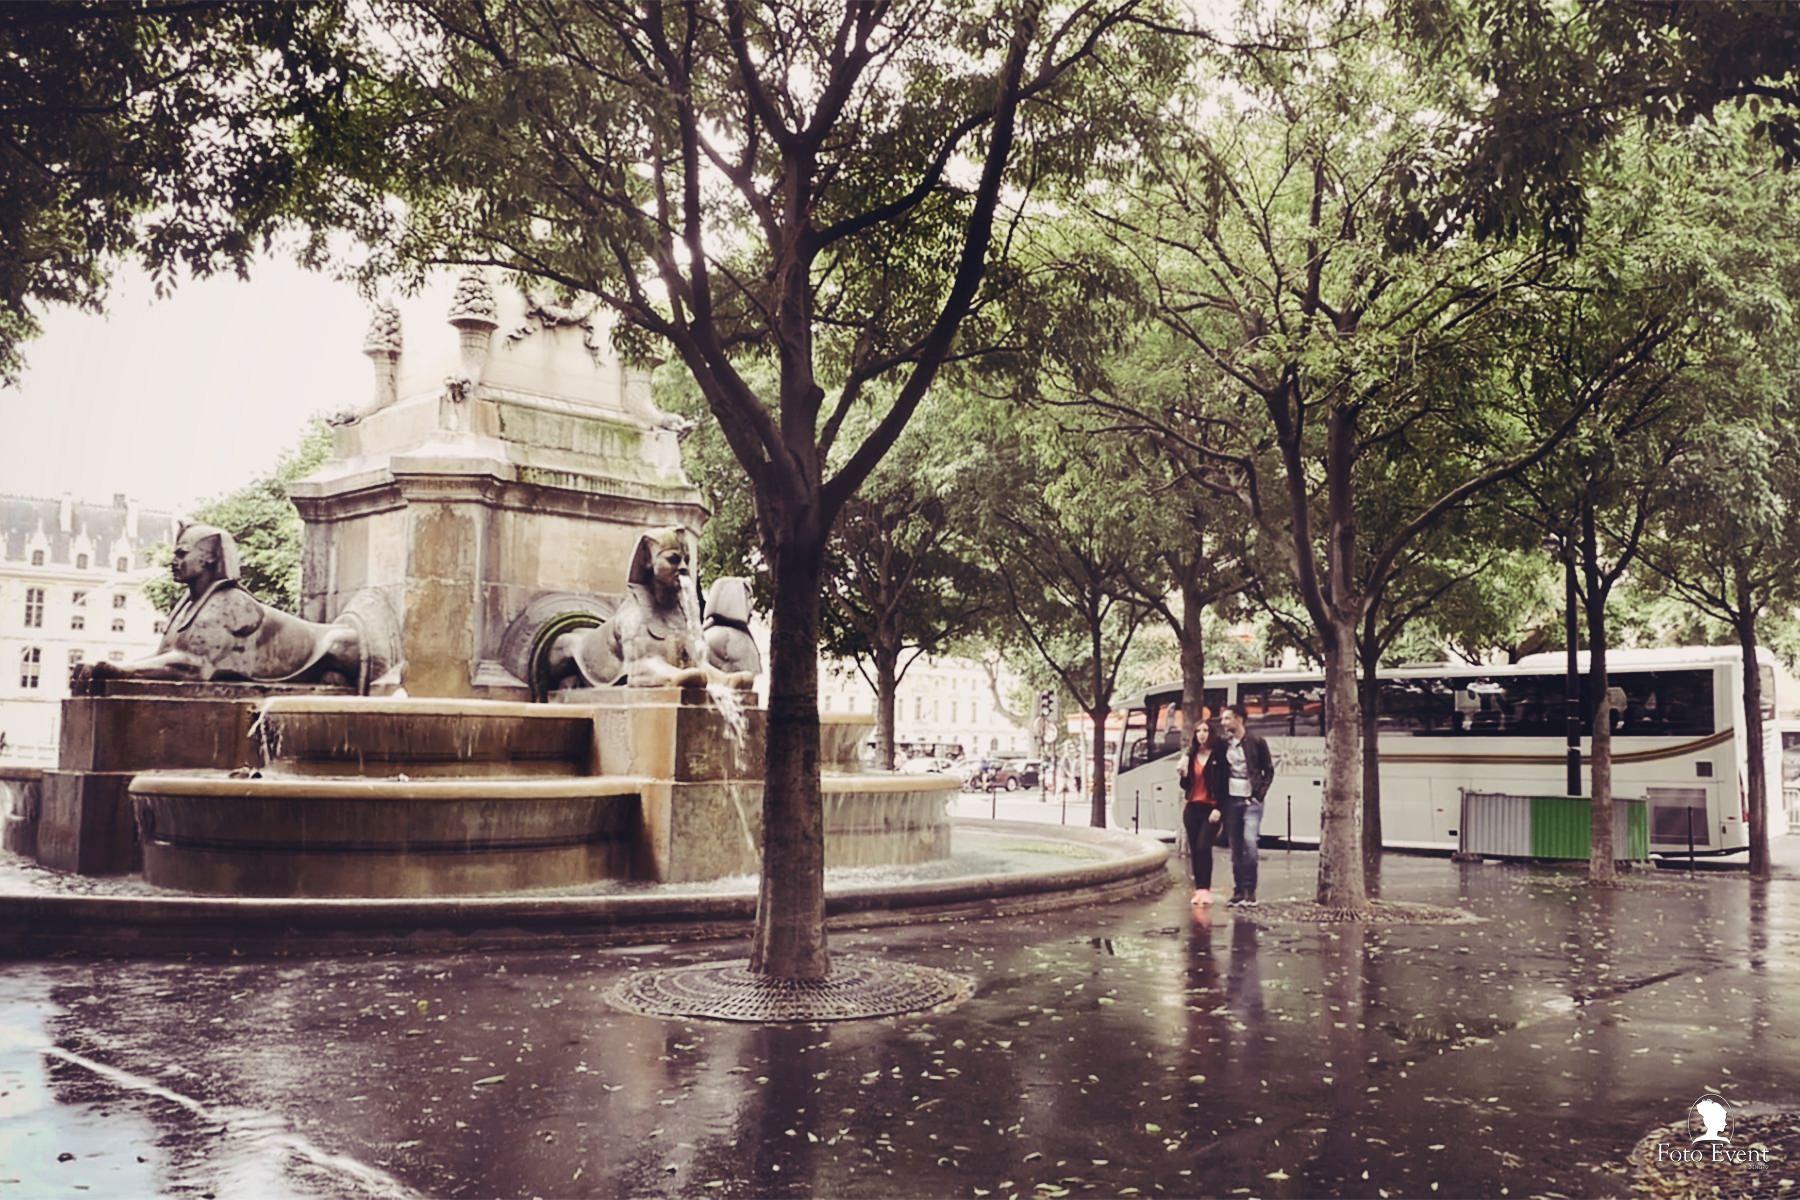 2016-08-04 Annalisa e Rosario - Anteprima.mp4_snapshot_03.24_[2017.02.07_10.19.34]